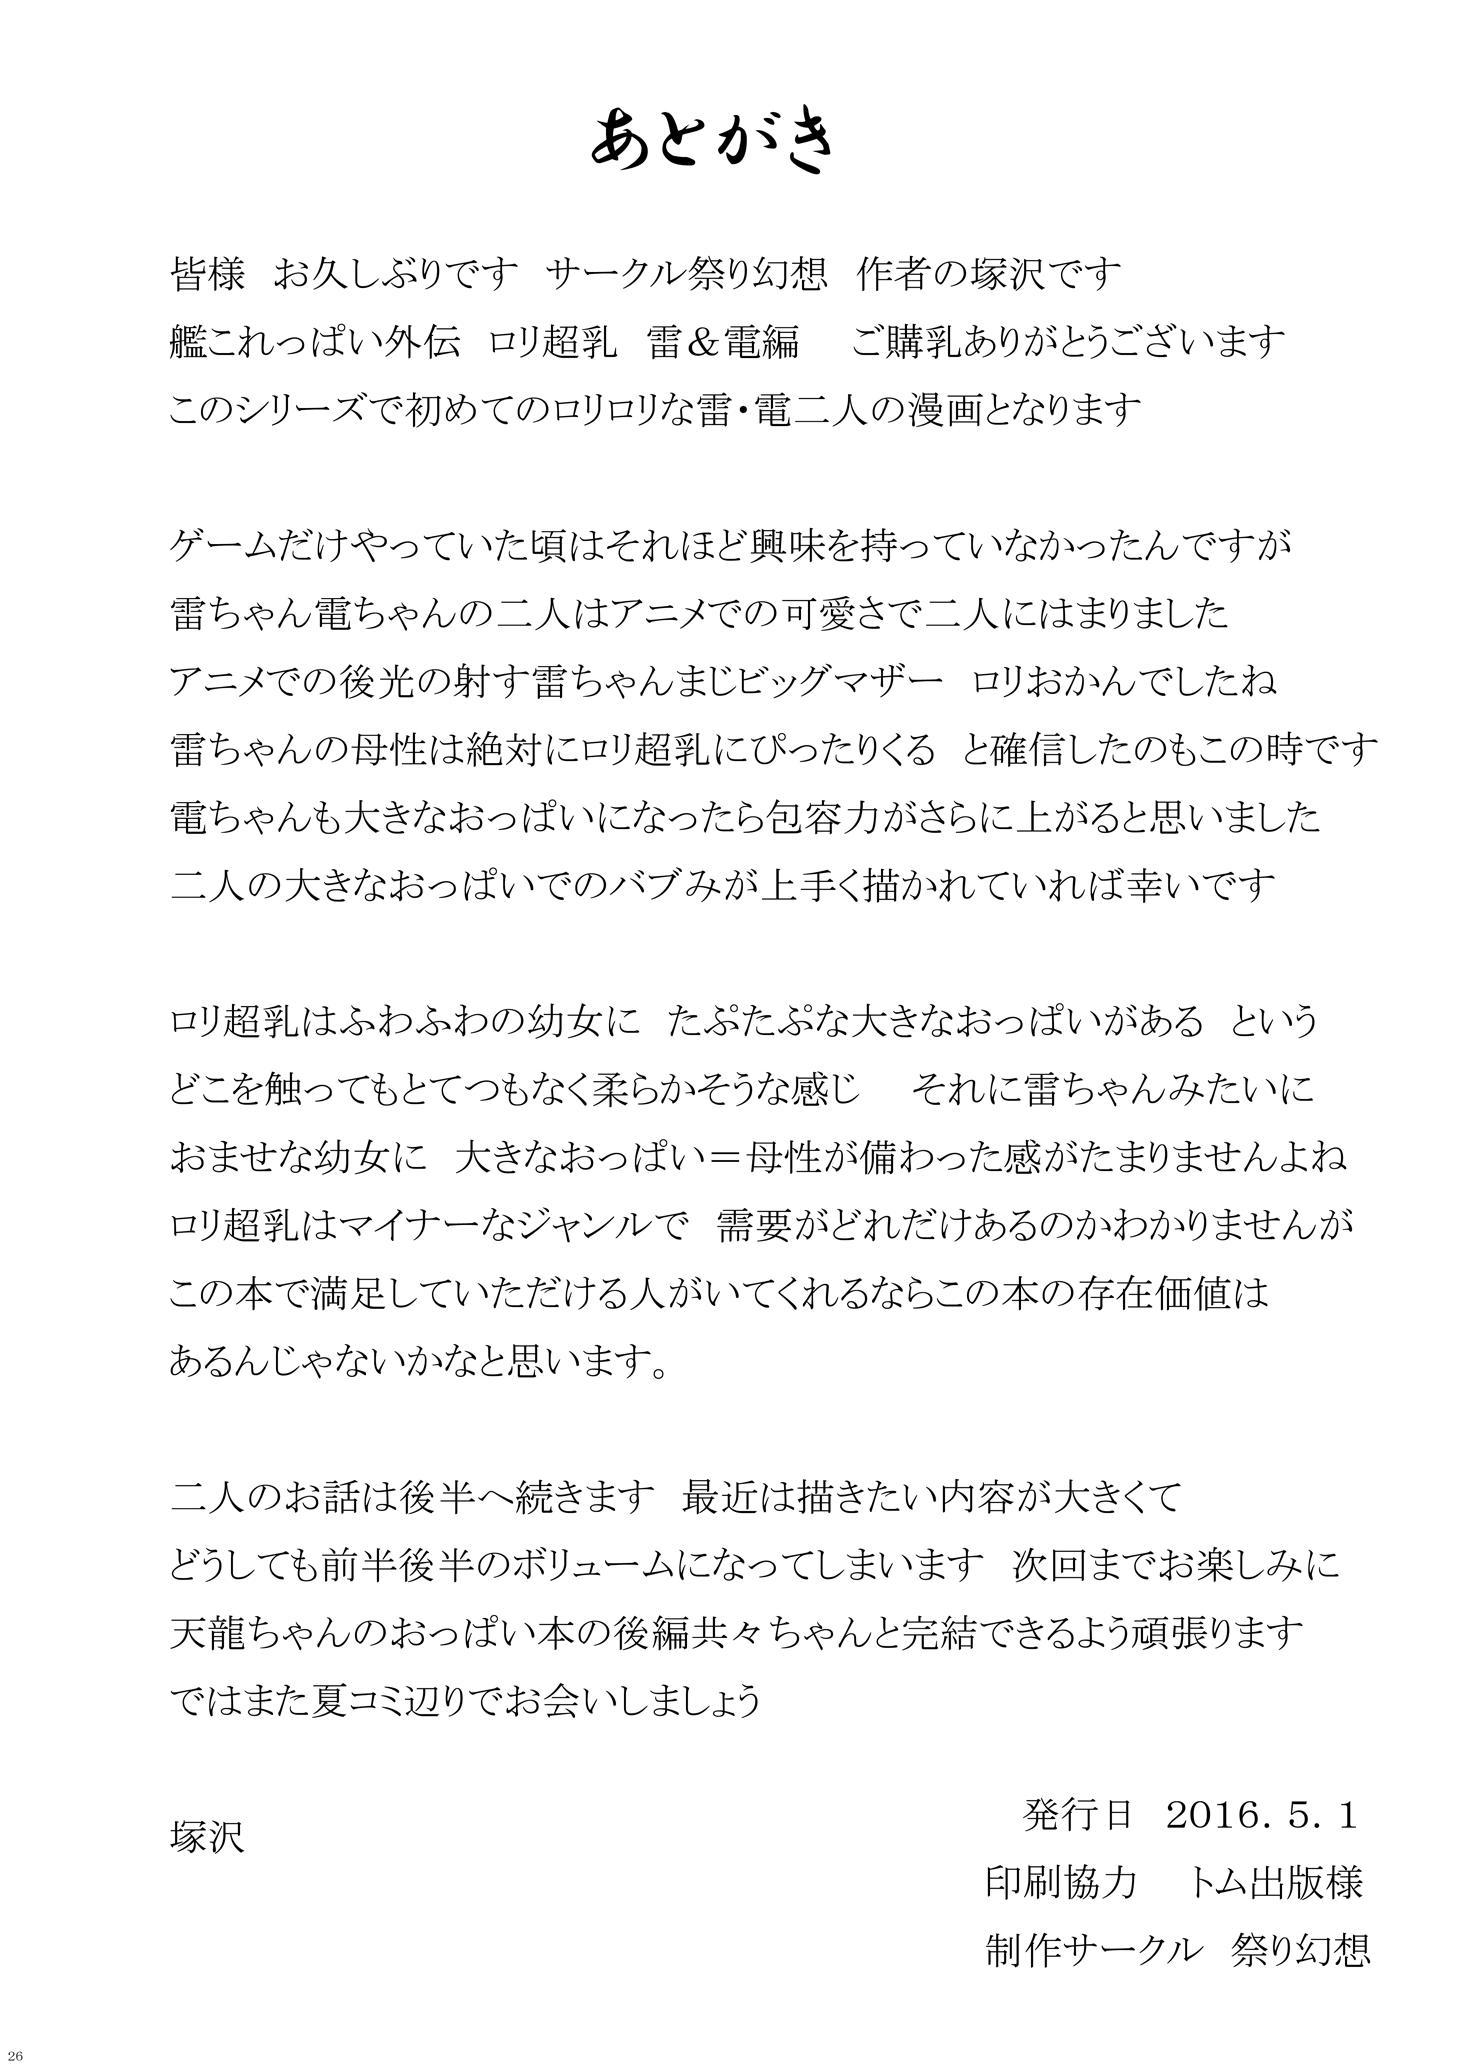 KanColleppai Gaiden Loli Chounyuu Ikazuchi・Inazuma Hen Zenpen 24